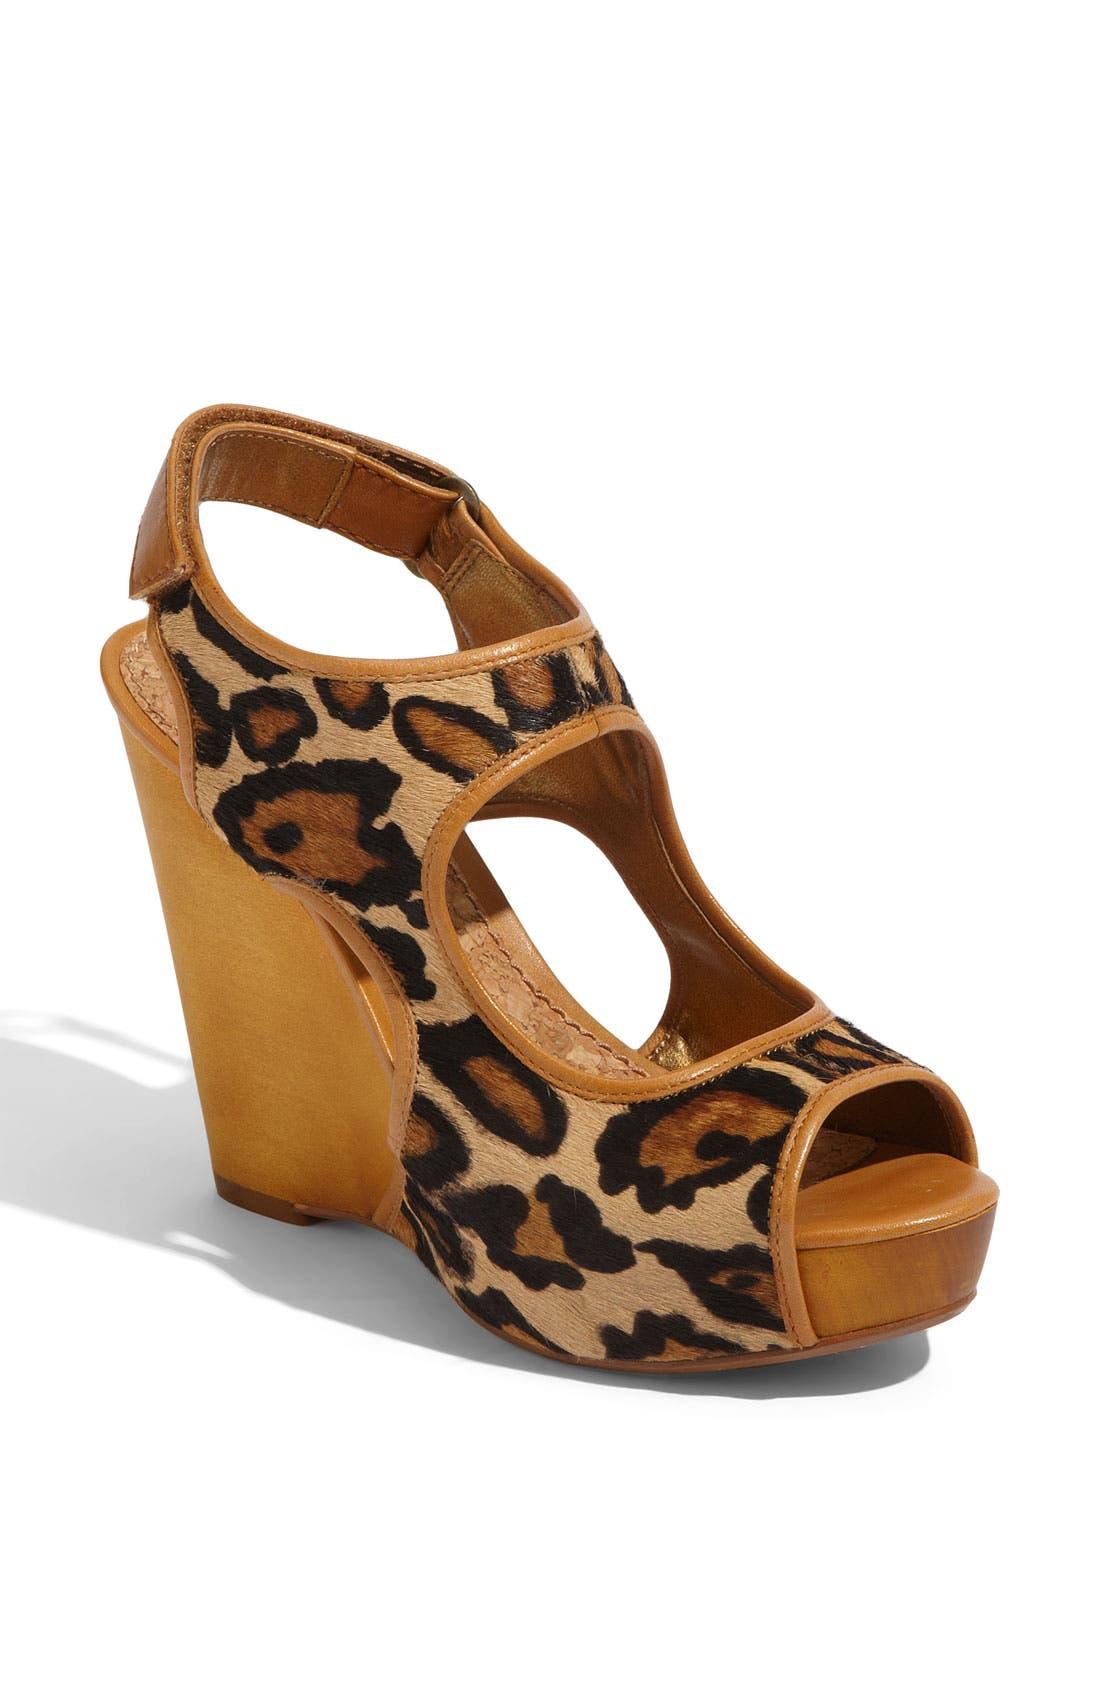 Main Image - Sam Edelman 'Kendall' Wedge Sandal